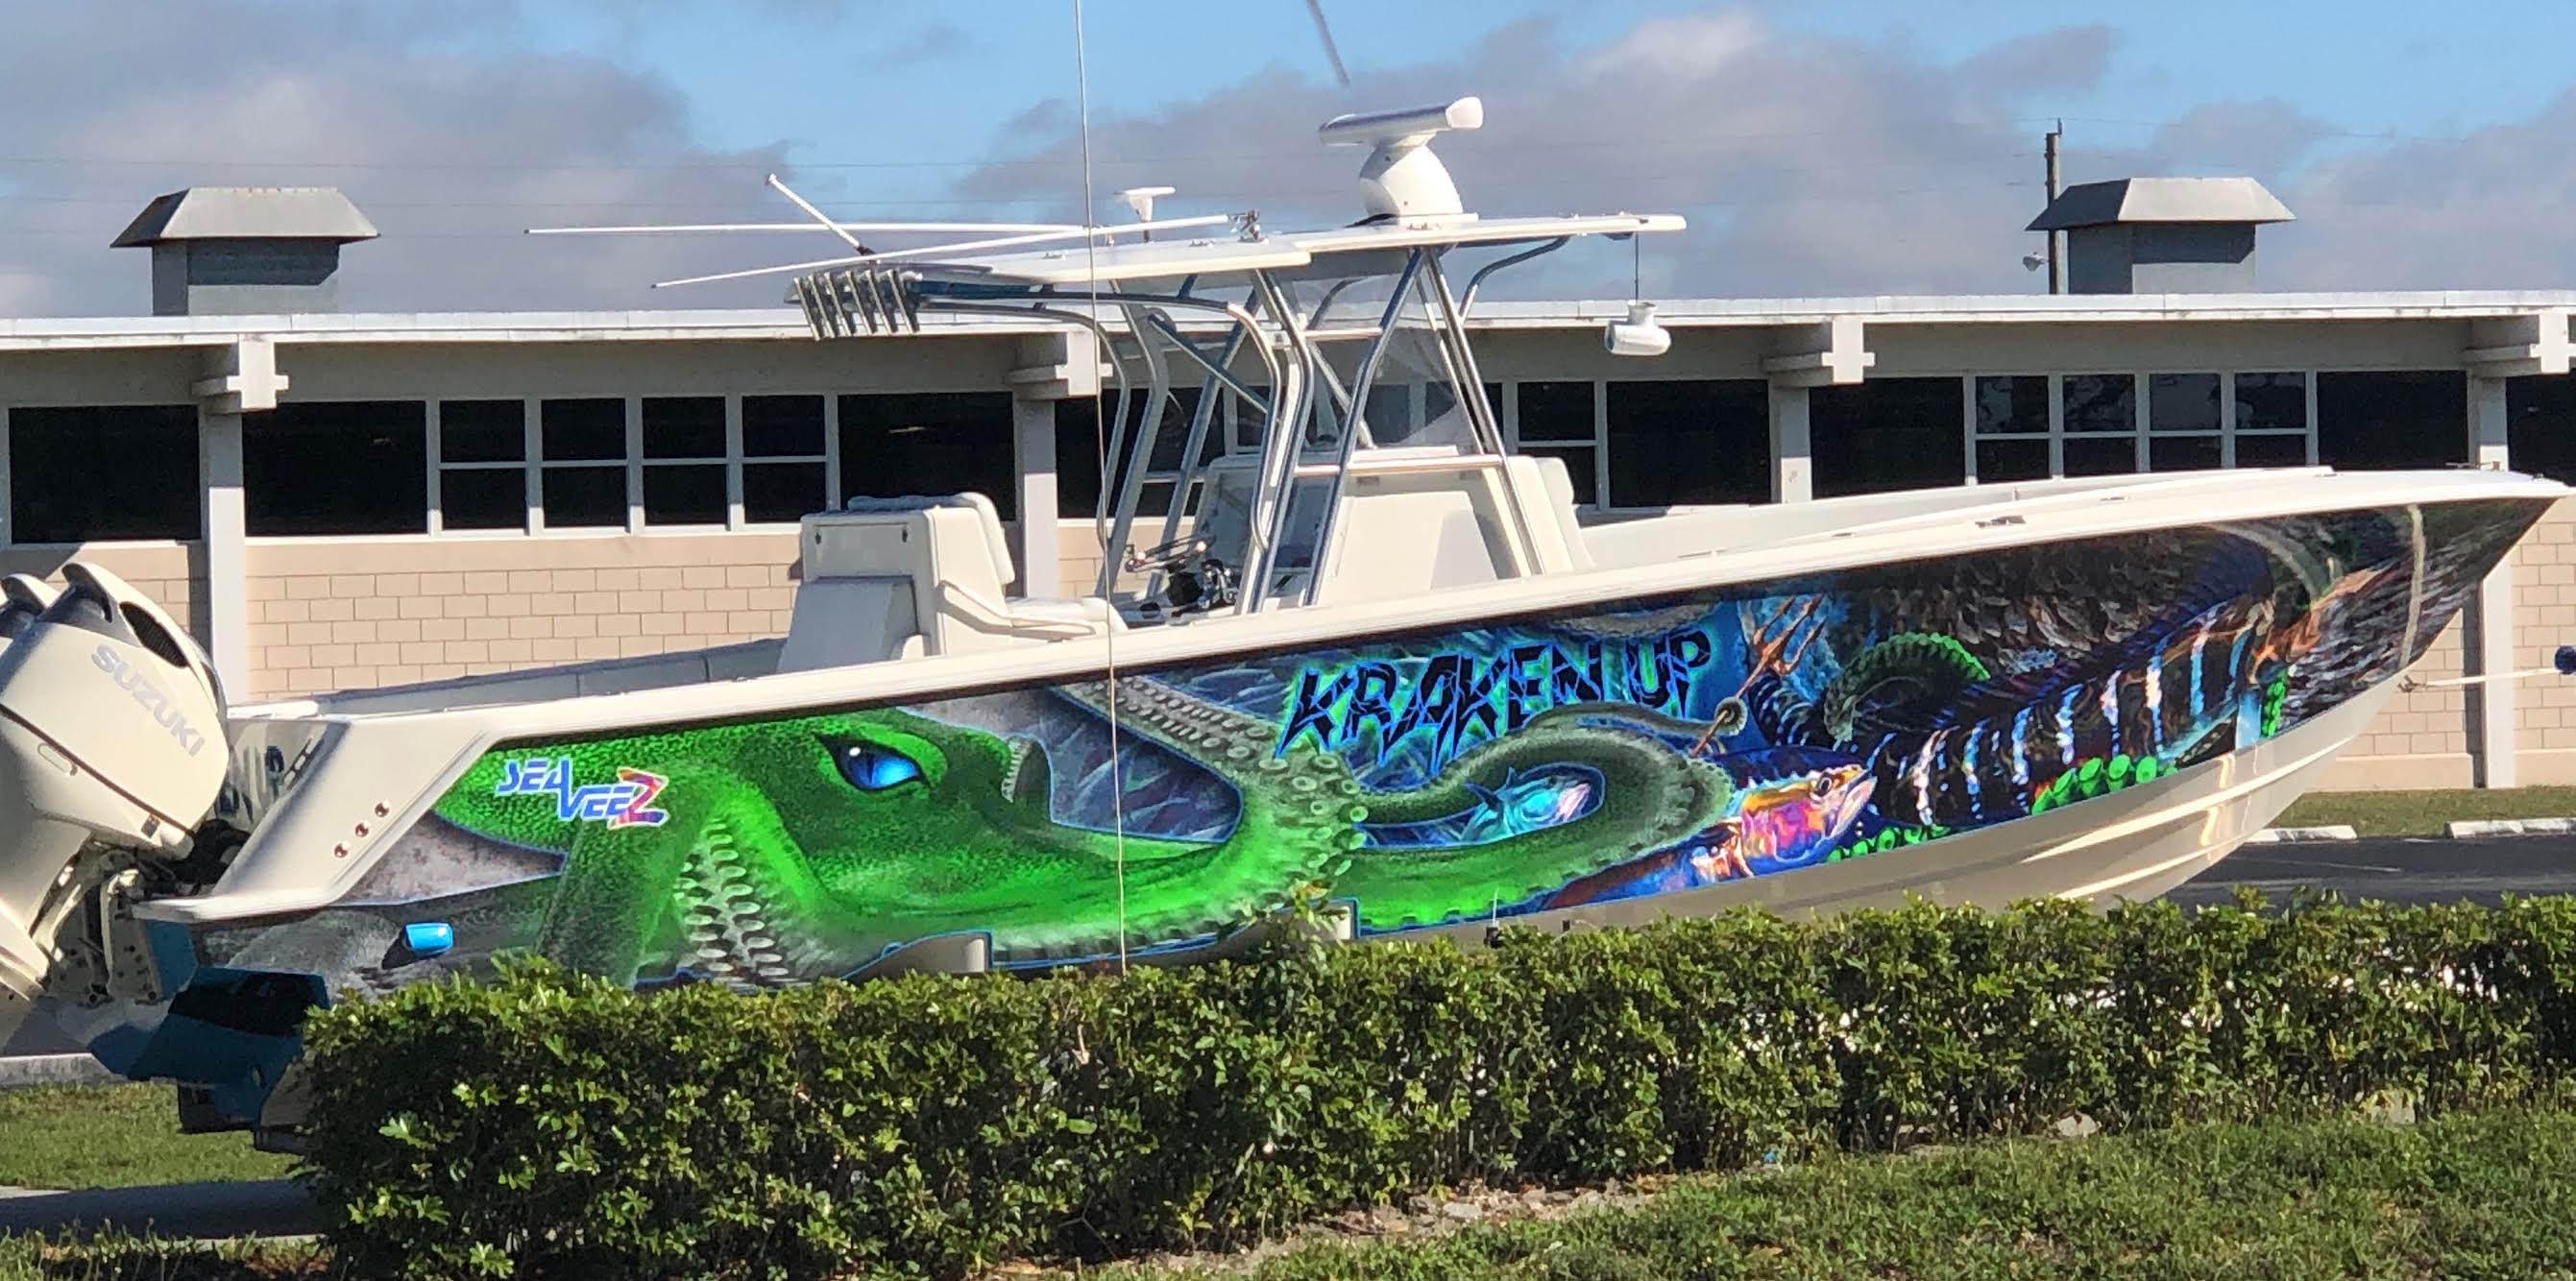 the-kraken-boat-wrap-art-desing-by-jason-mathias.jpg